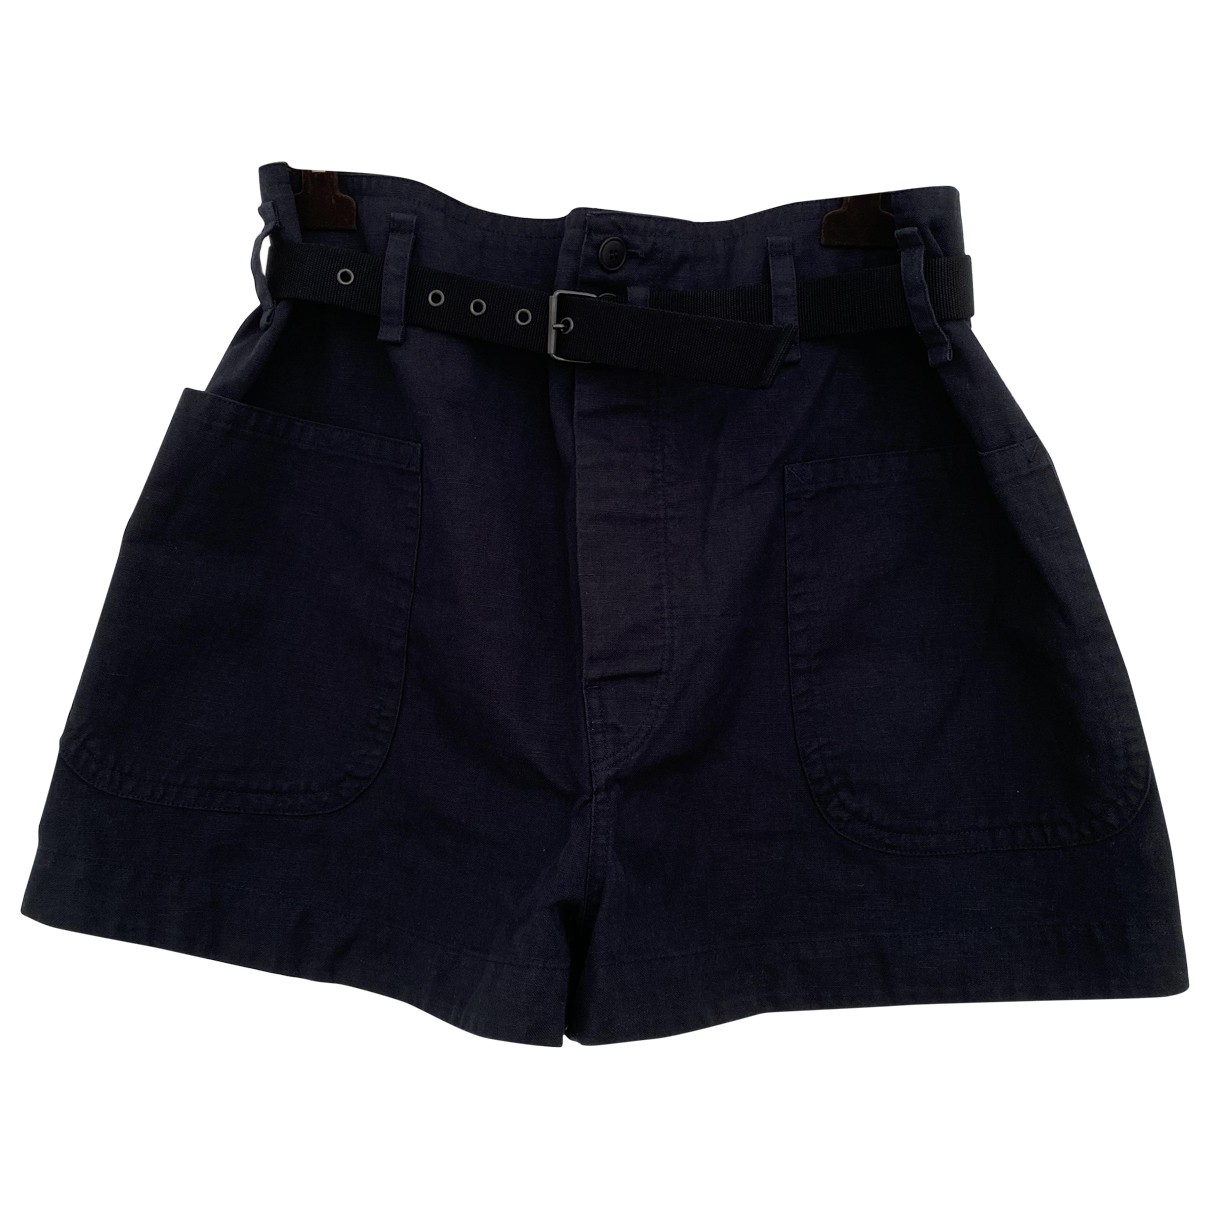 Isabel Marant Etoile \N Shorts in  Blau Baumwolle